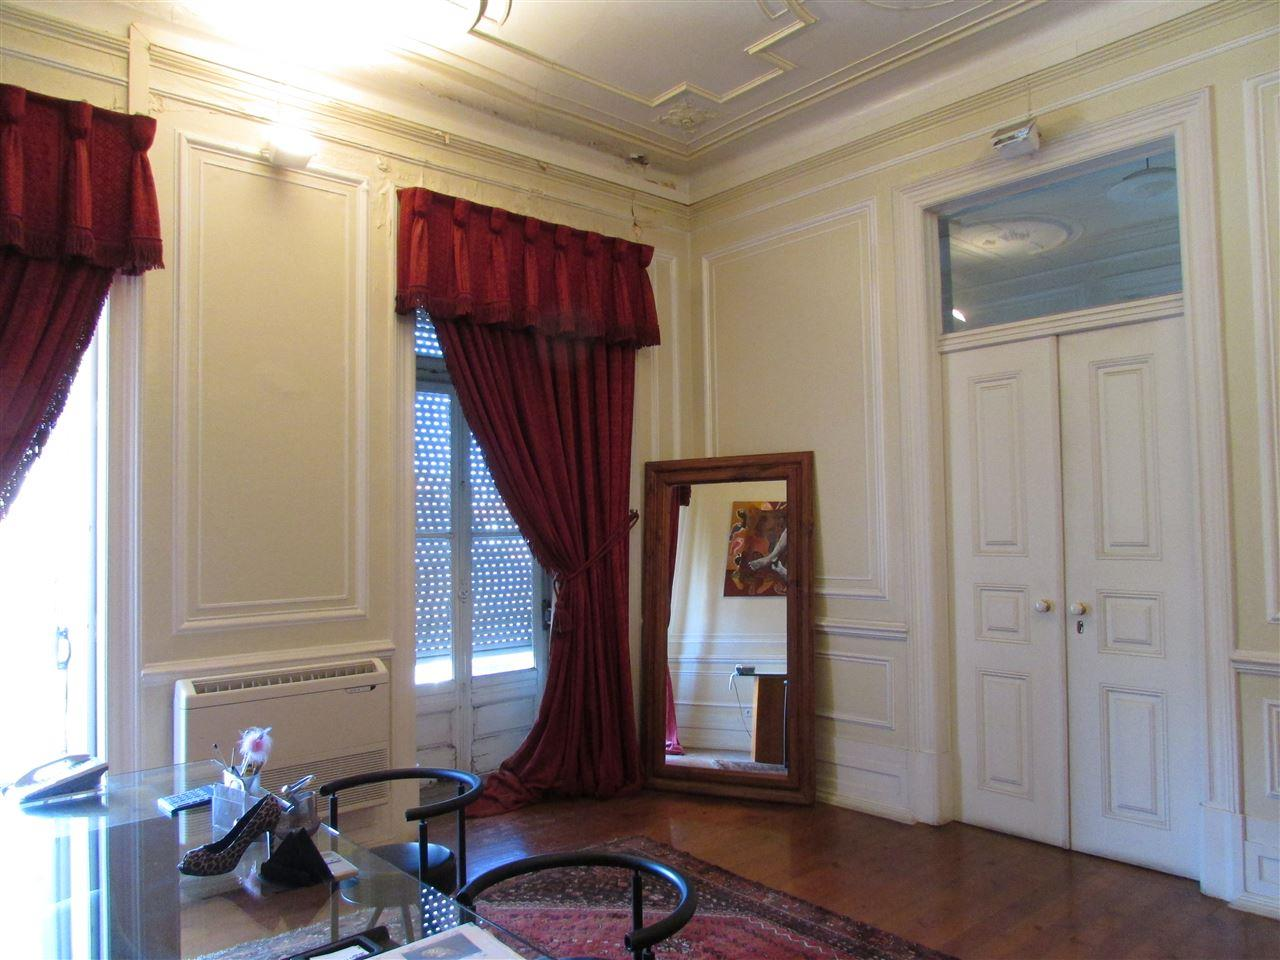 Apartment for Sale at Flat, 10 bedrooms, for Sale Lisboa, Lisboa 1050-191 Portugal